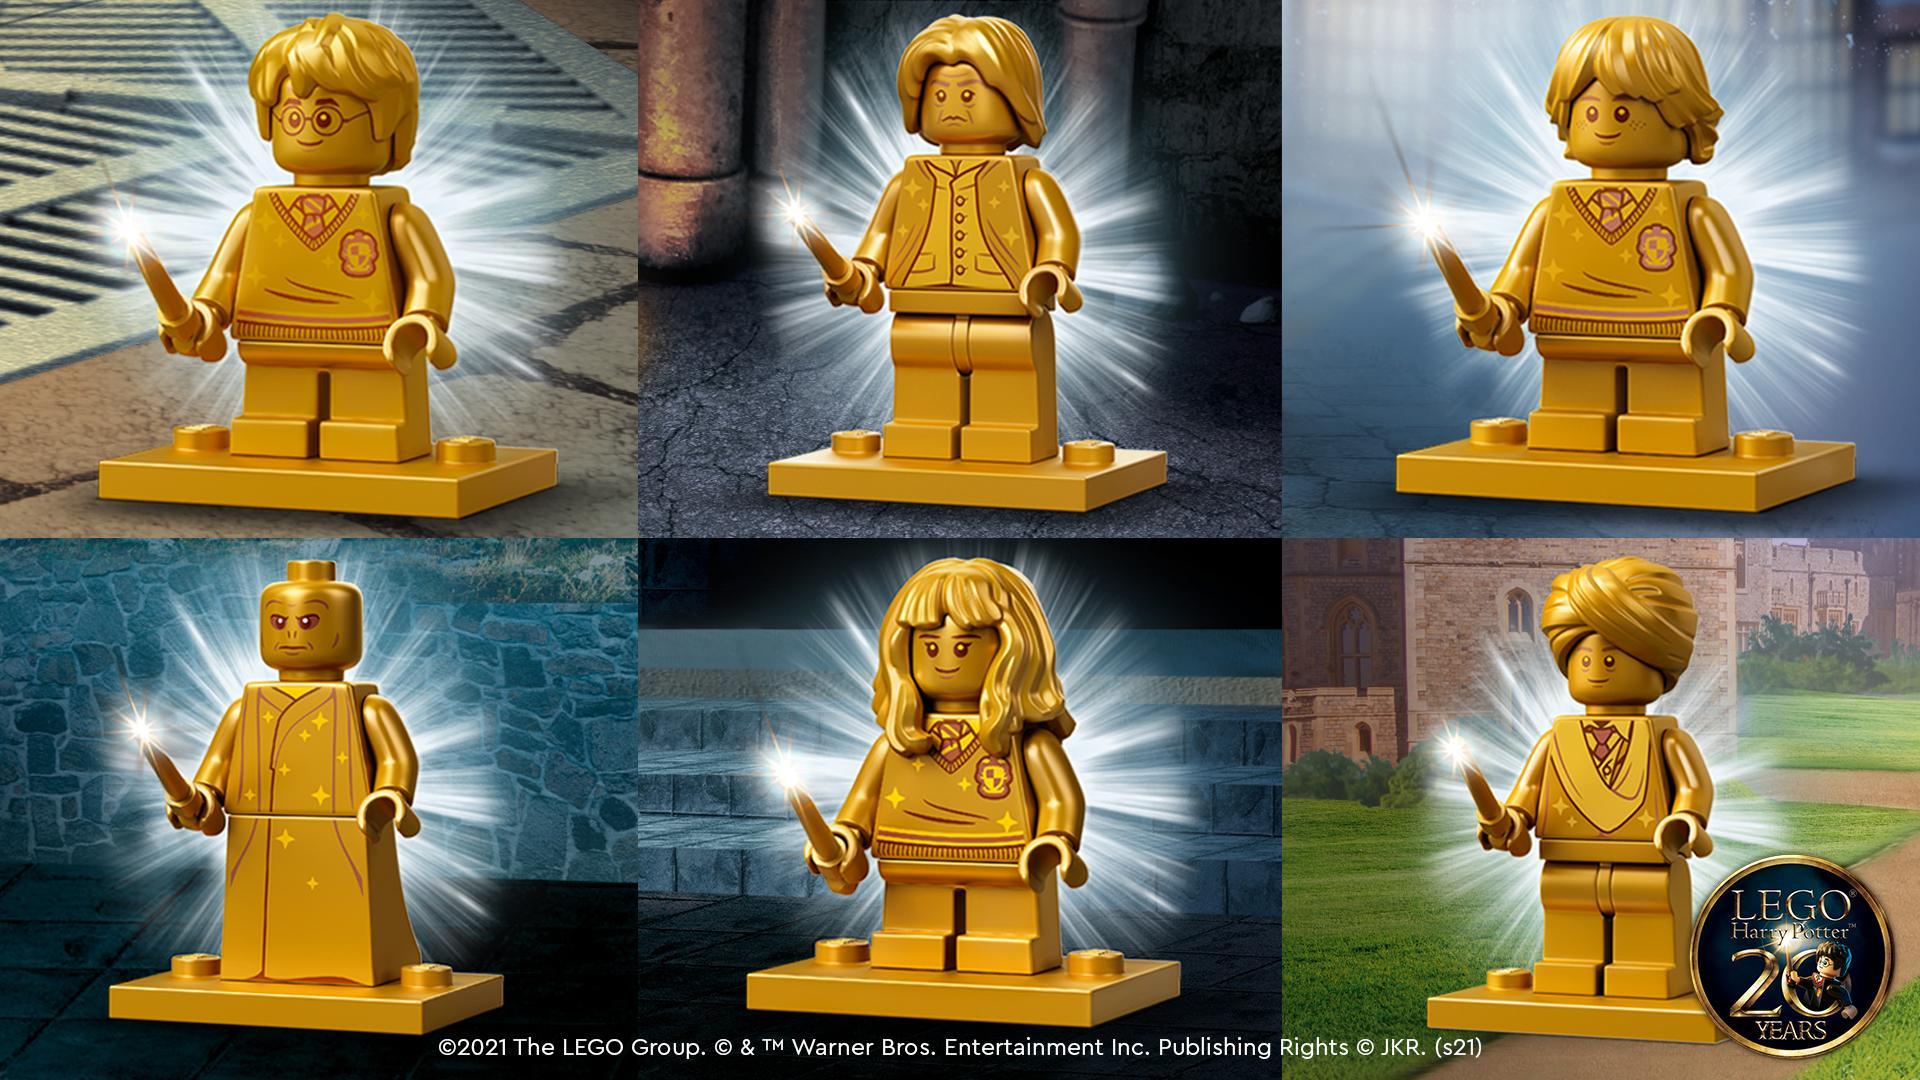 lego celebrates 20 years of lego harry potter with golden